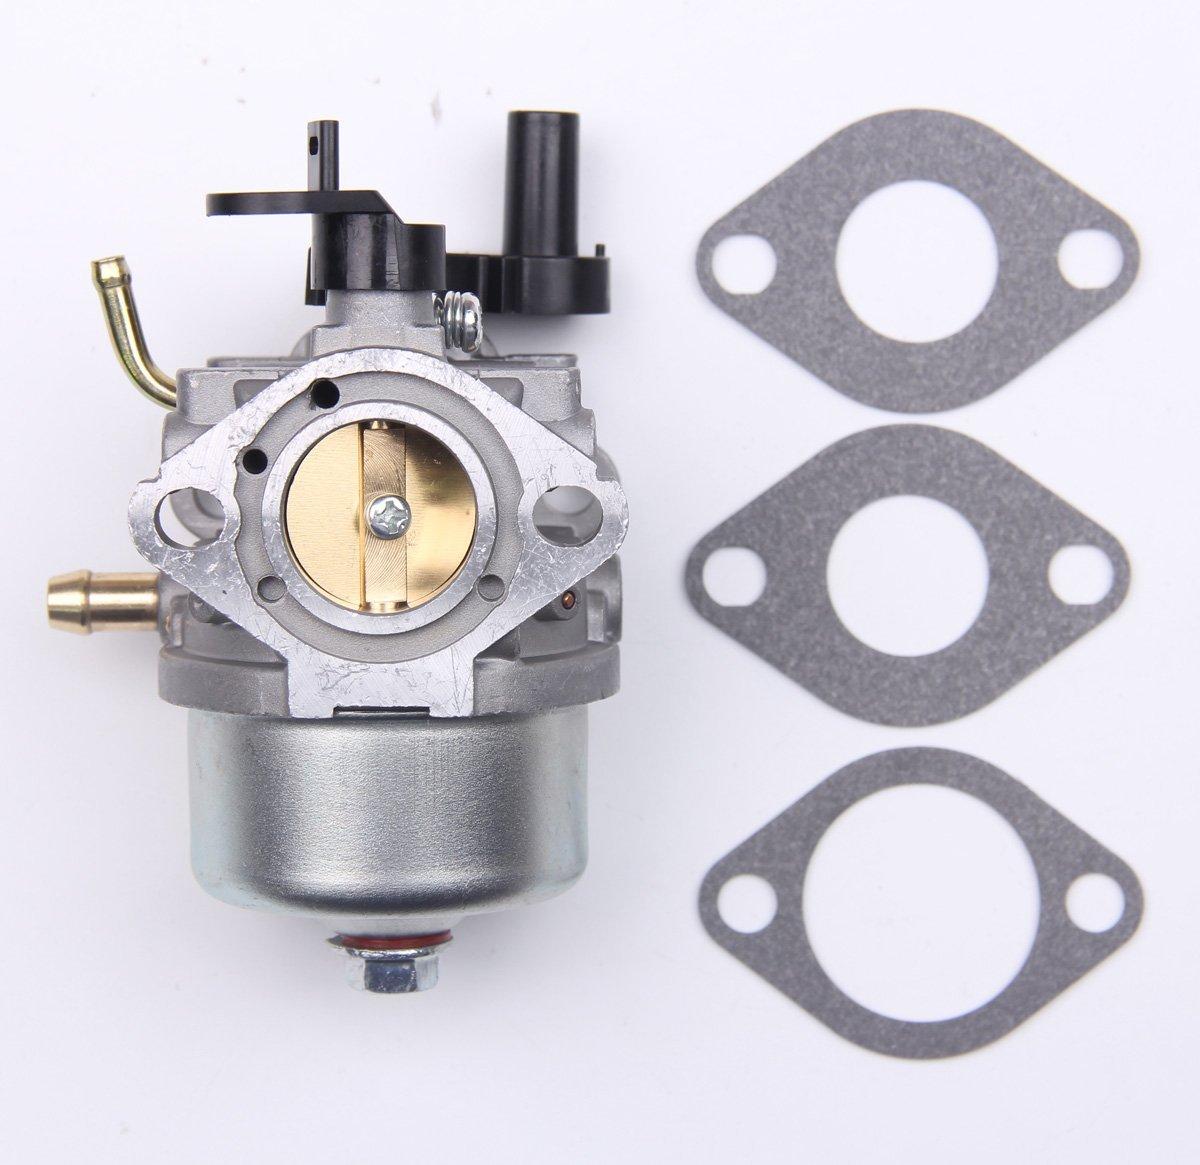 New Snowblower Carburetor For TORO CCR2450 CCR3650 Powerclear Lawnboy Insight Models